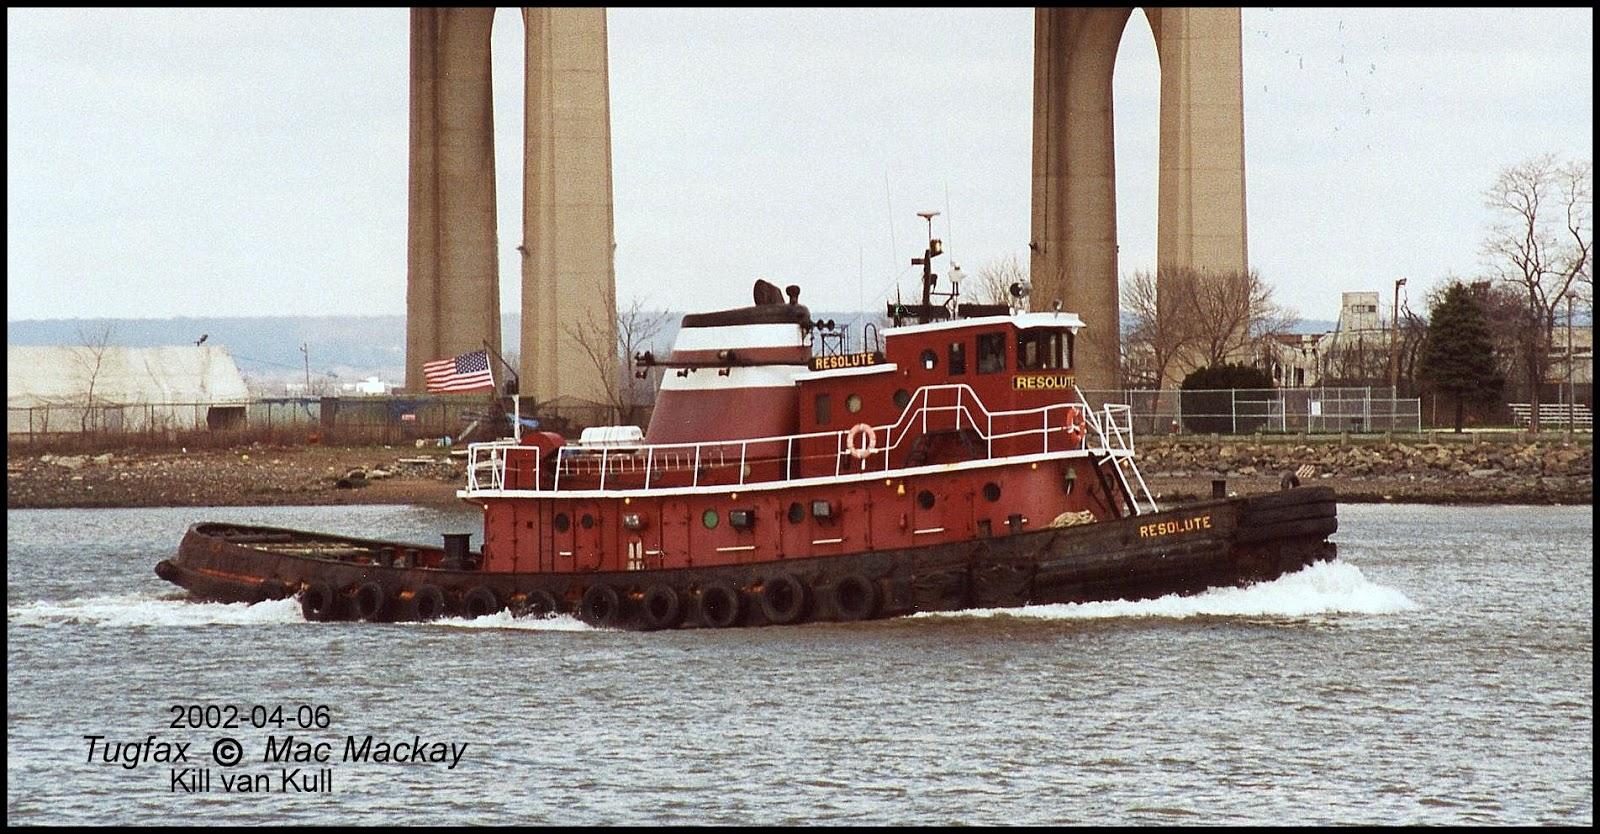 Tugfax: Boston Tugs - Part 2